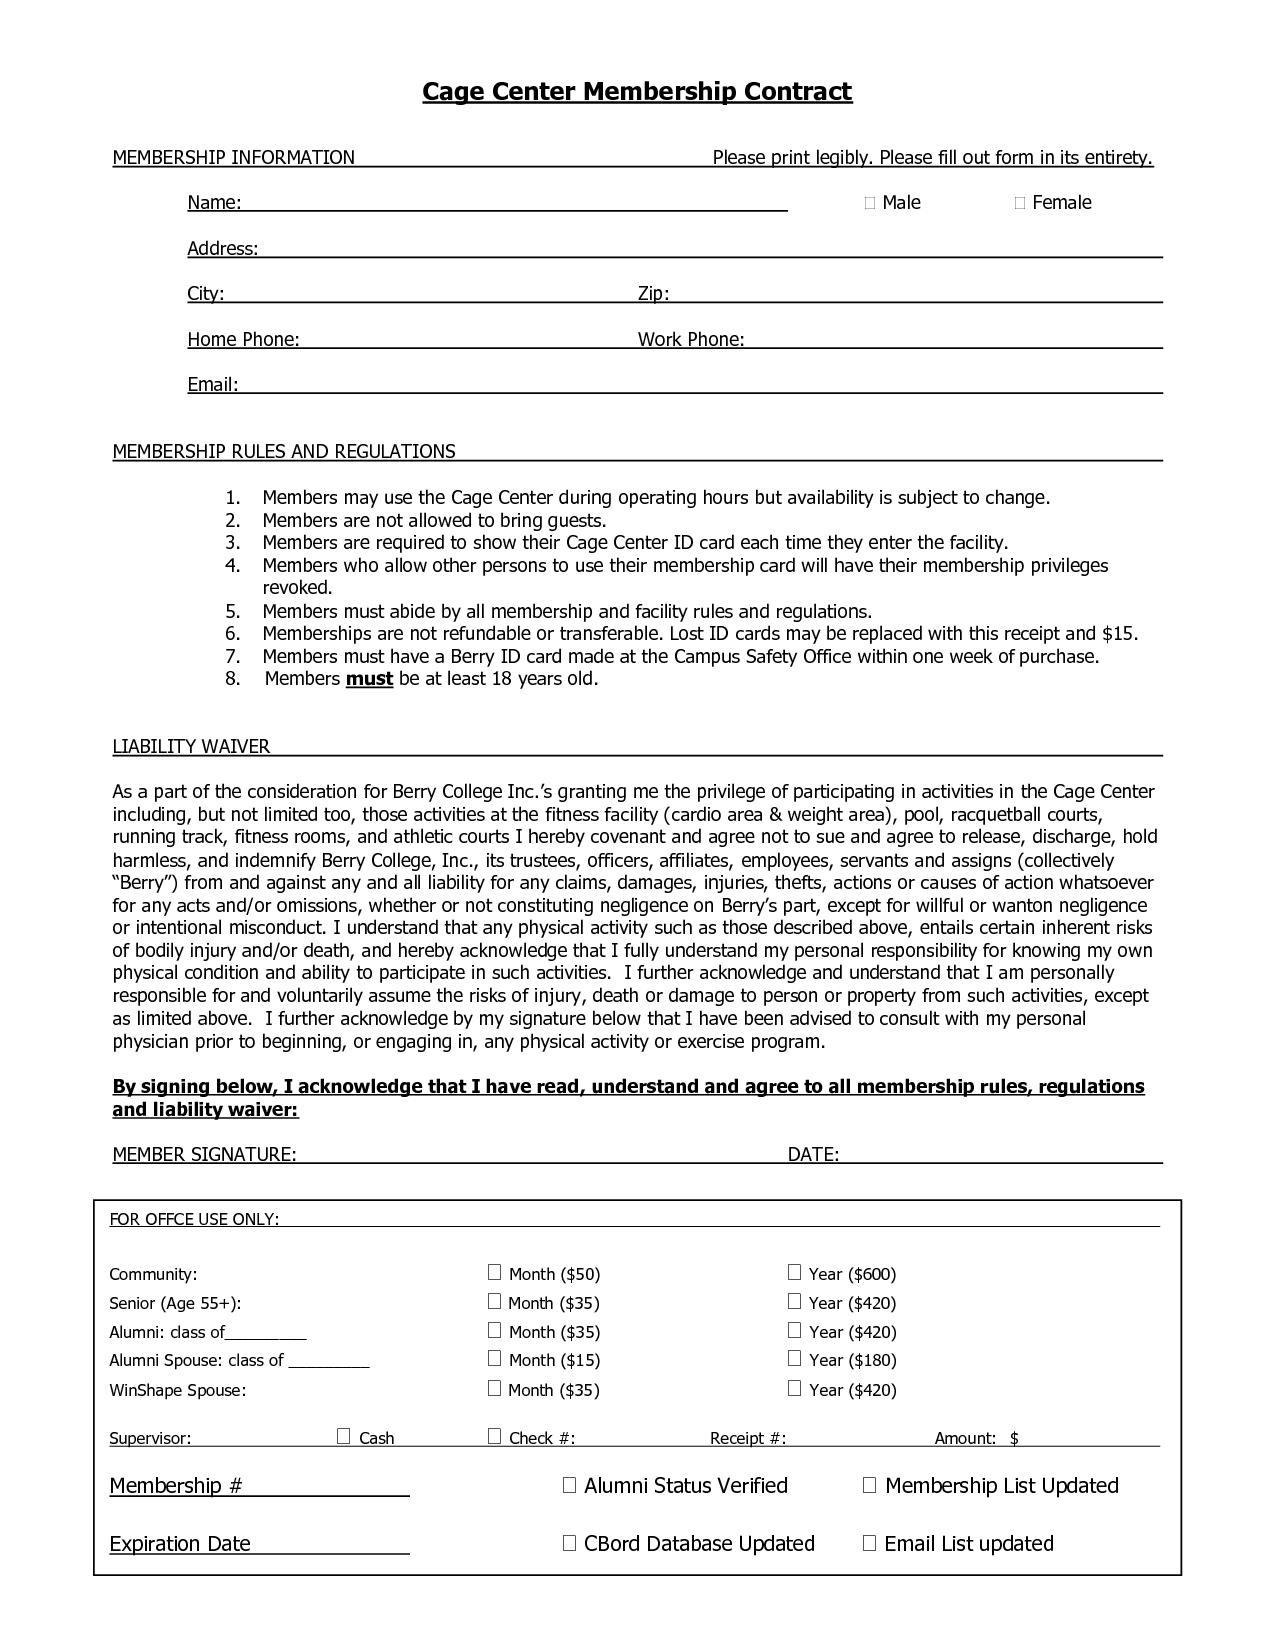 Letter sample cancellation flat booking fitness evolution san jose letter sample cancellation flat booking fitness evolution san jose united states cancelation spiritdancerdesigns Images